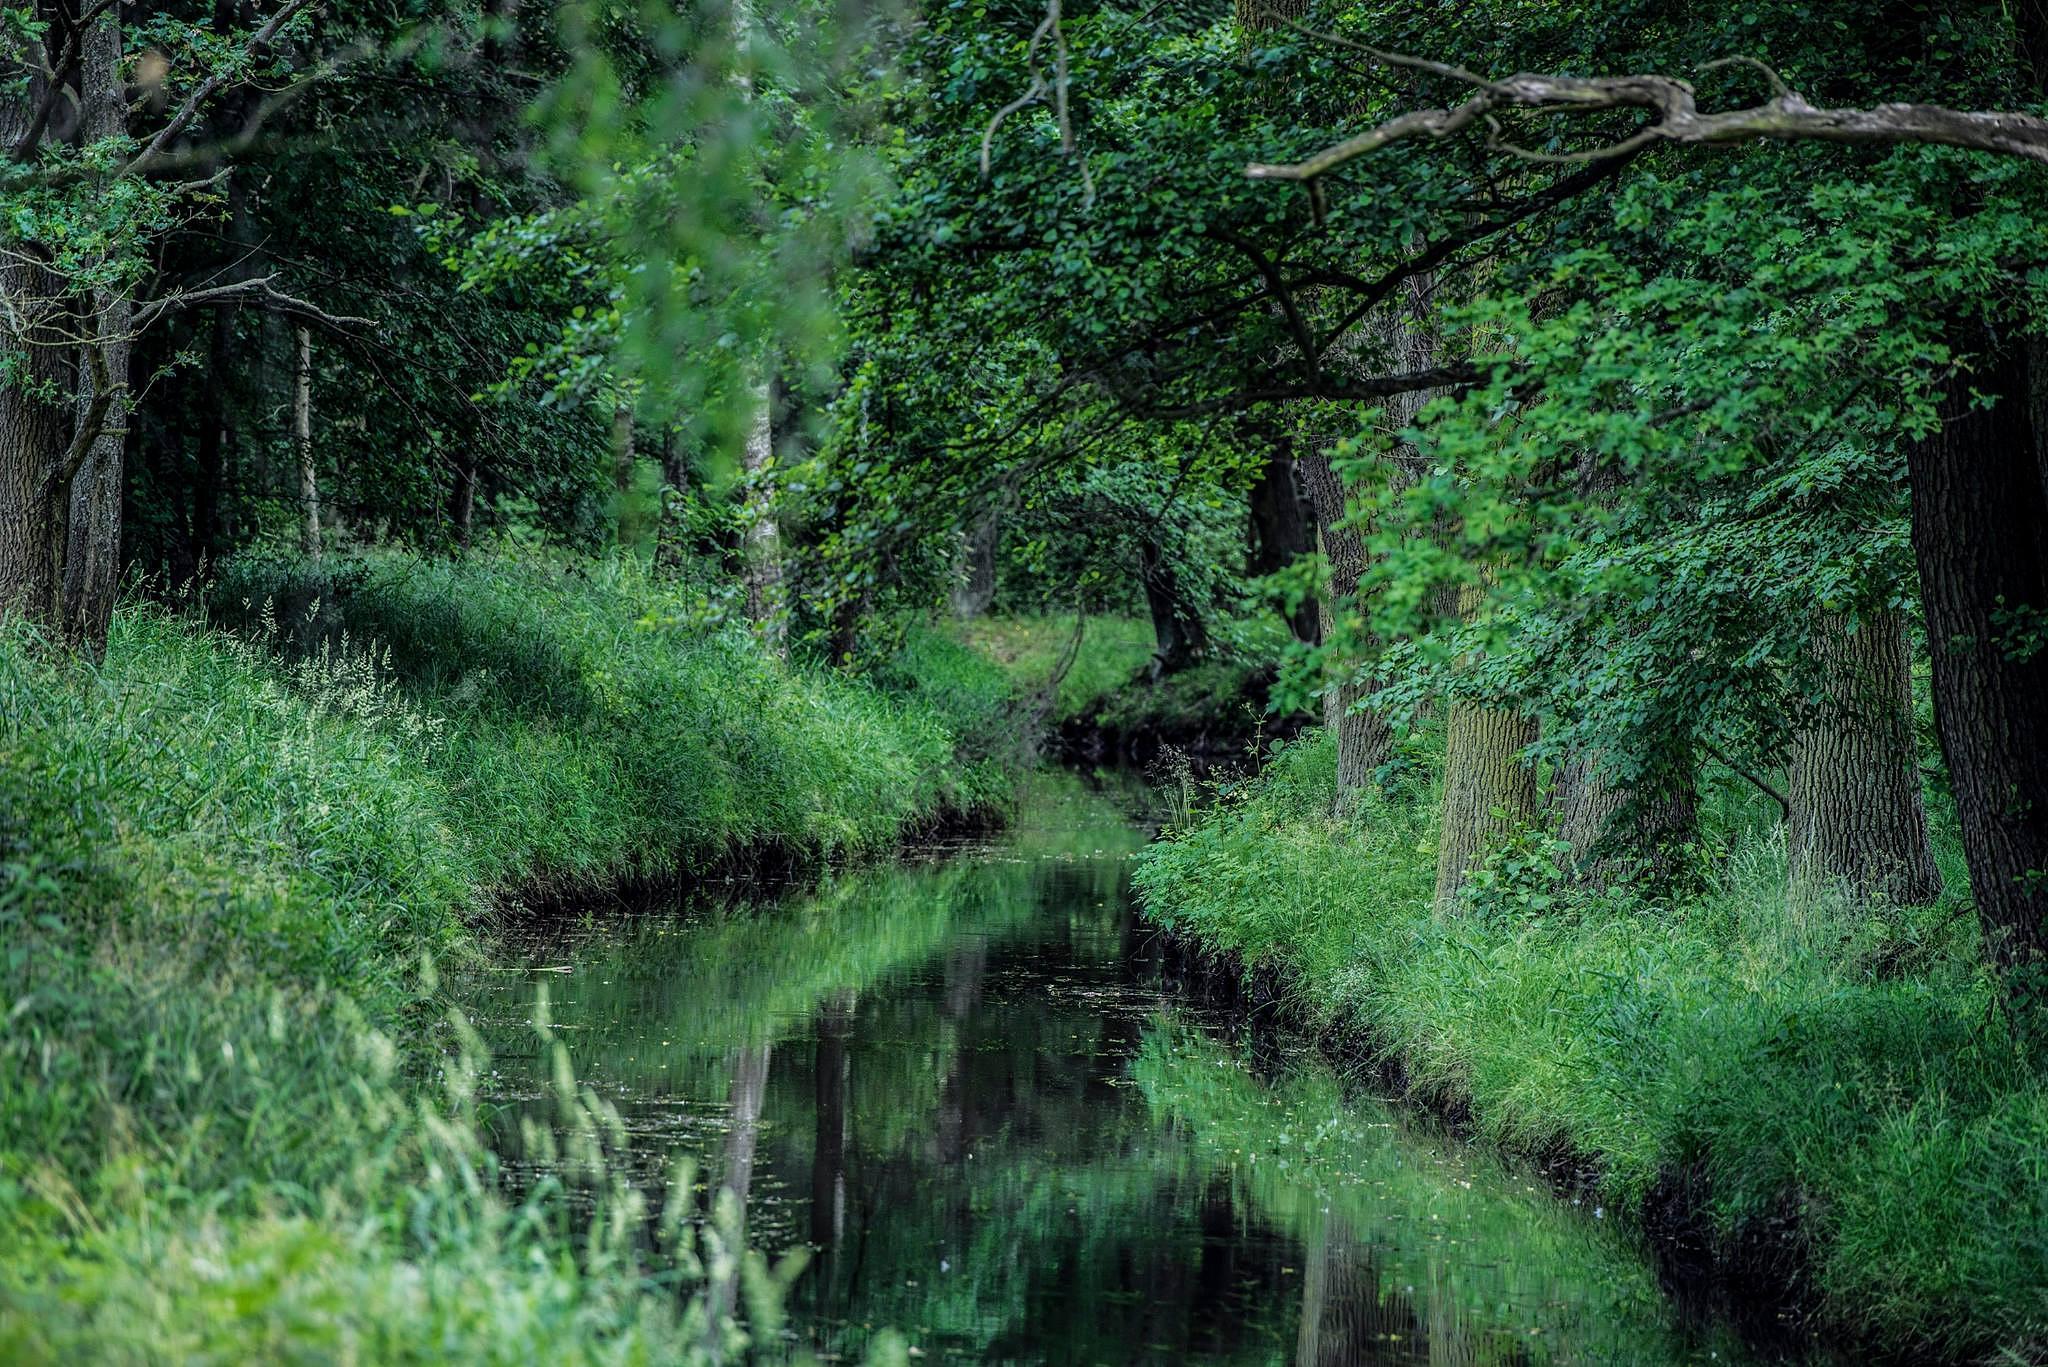 Brook in the forest by Waldemar Sadlowski